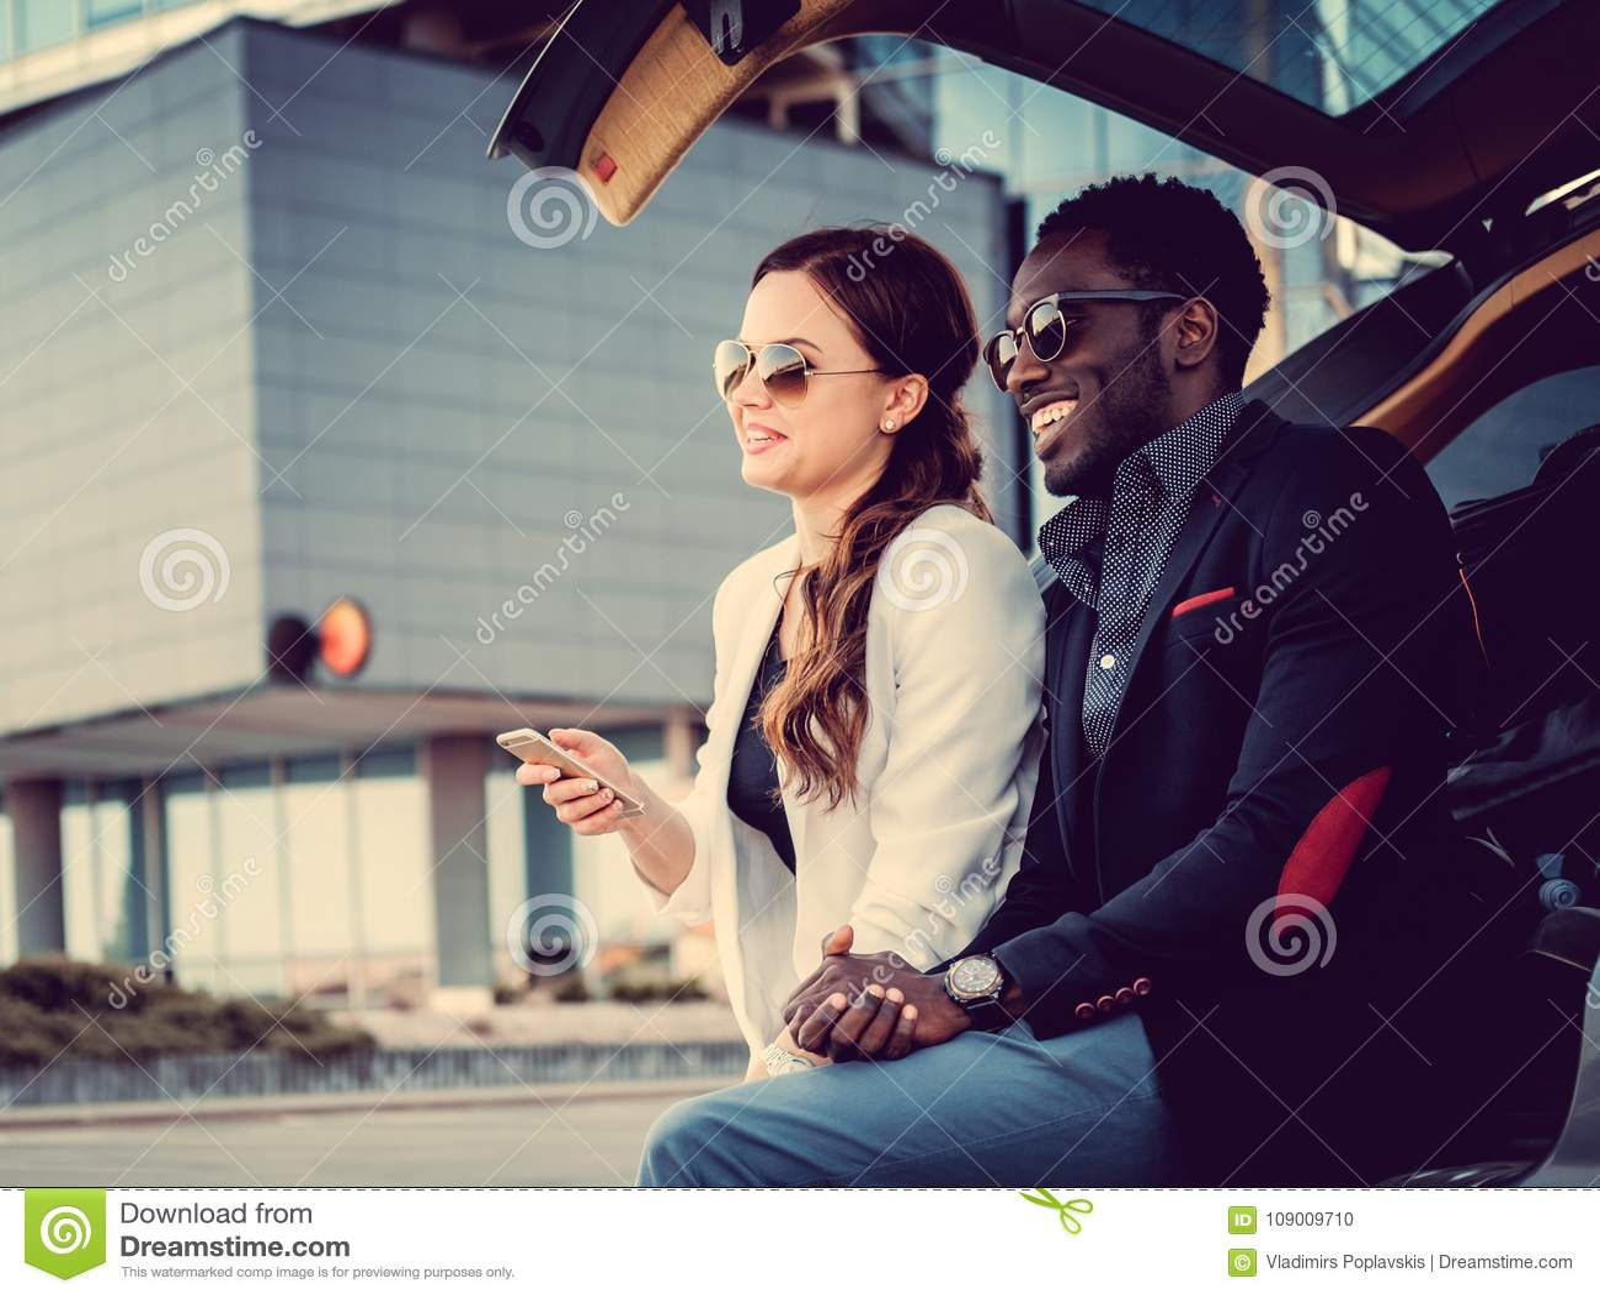 https://thumbs.dreamstime.com/z/international-couple-smartphone-near-car-international-couple-smartphone-near-car-downtown-109009710.jpg